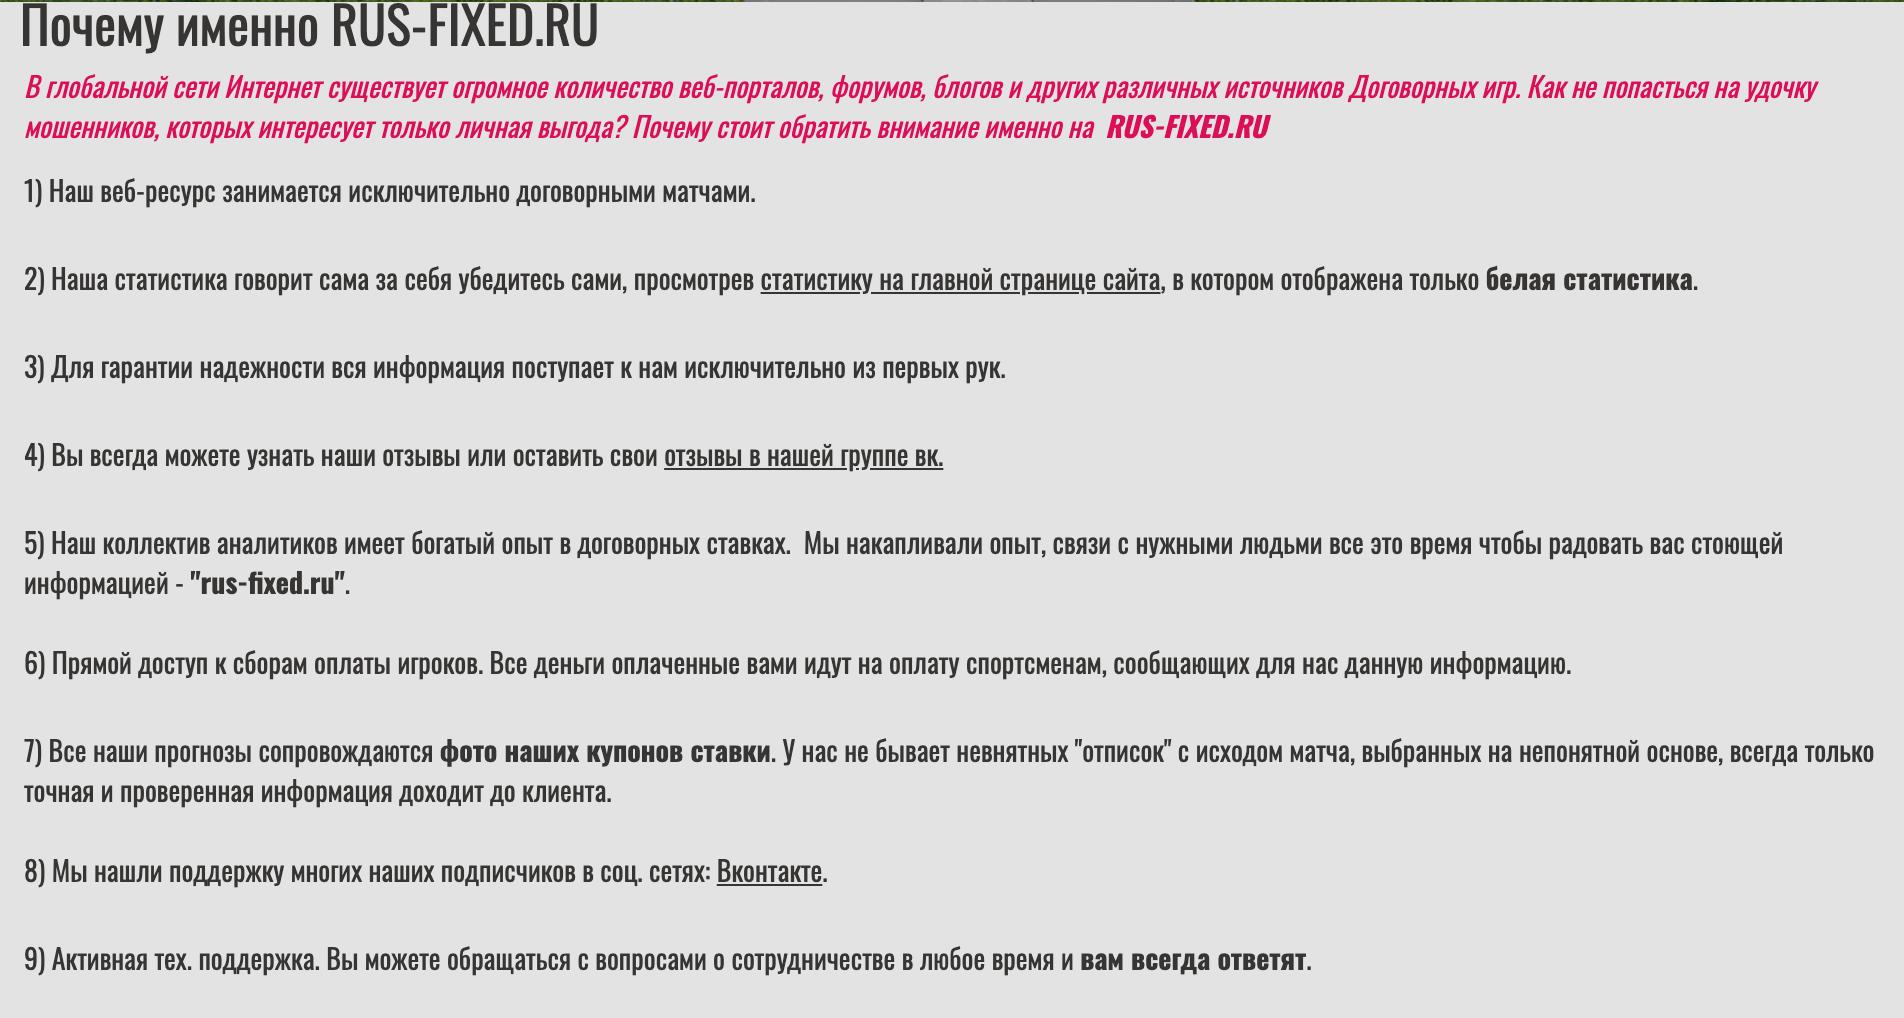 Контакты Rus-fixed.ru